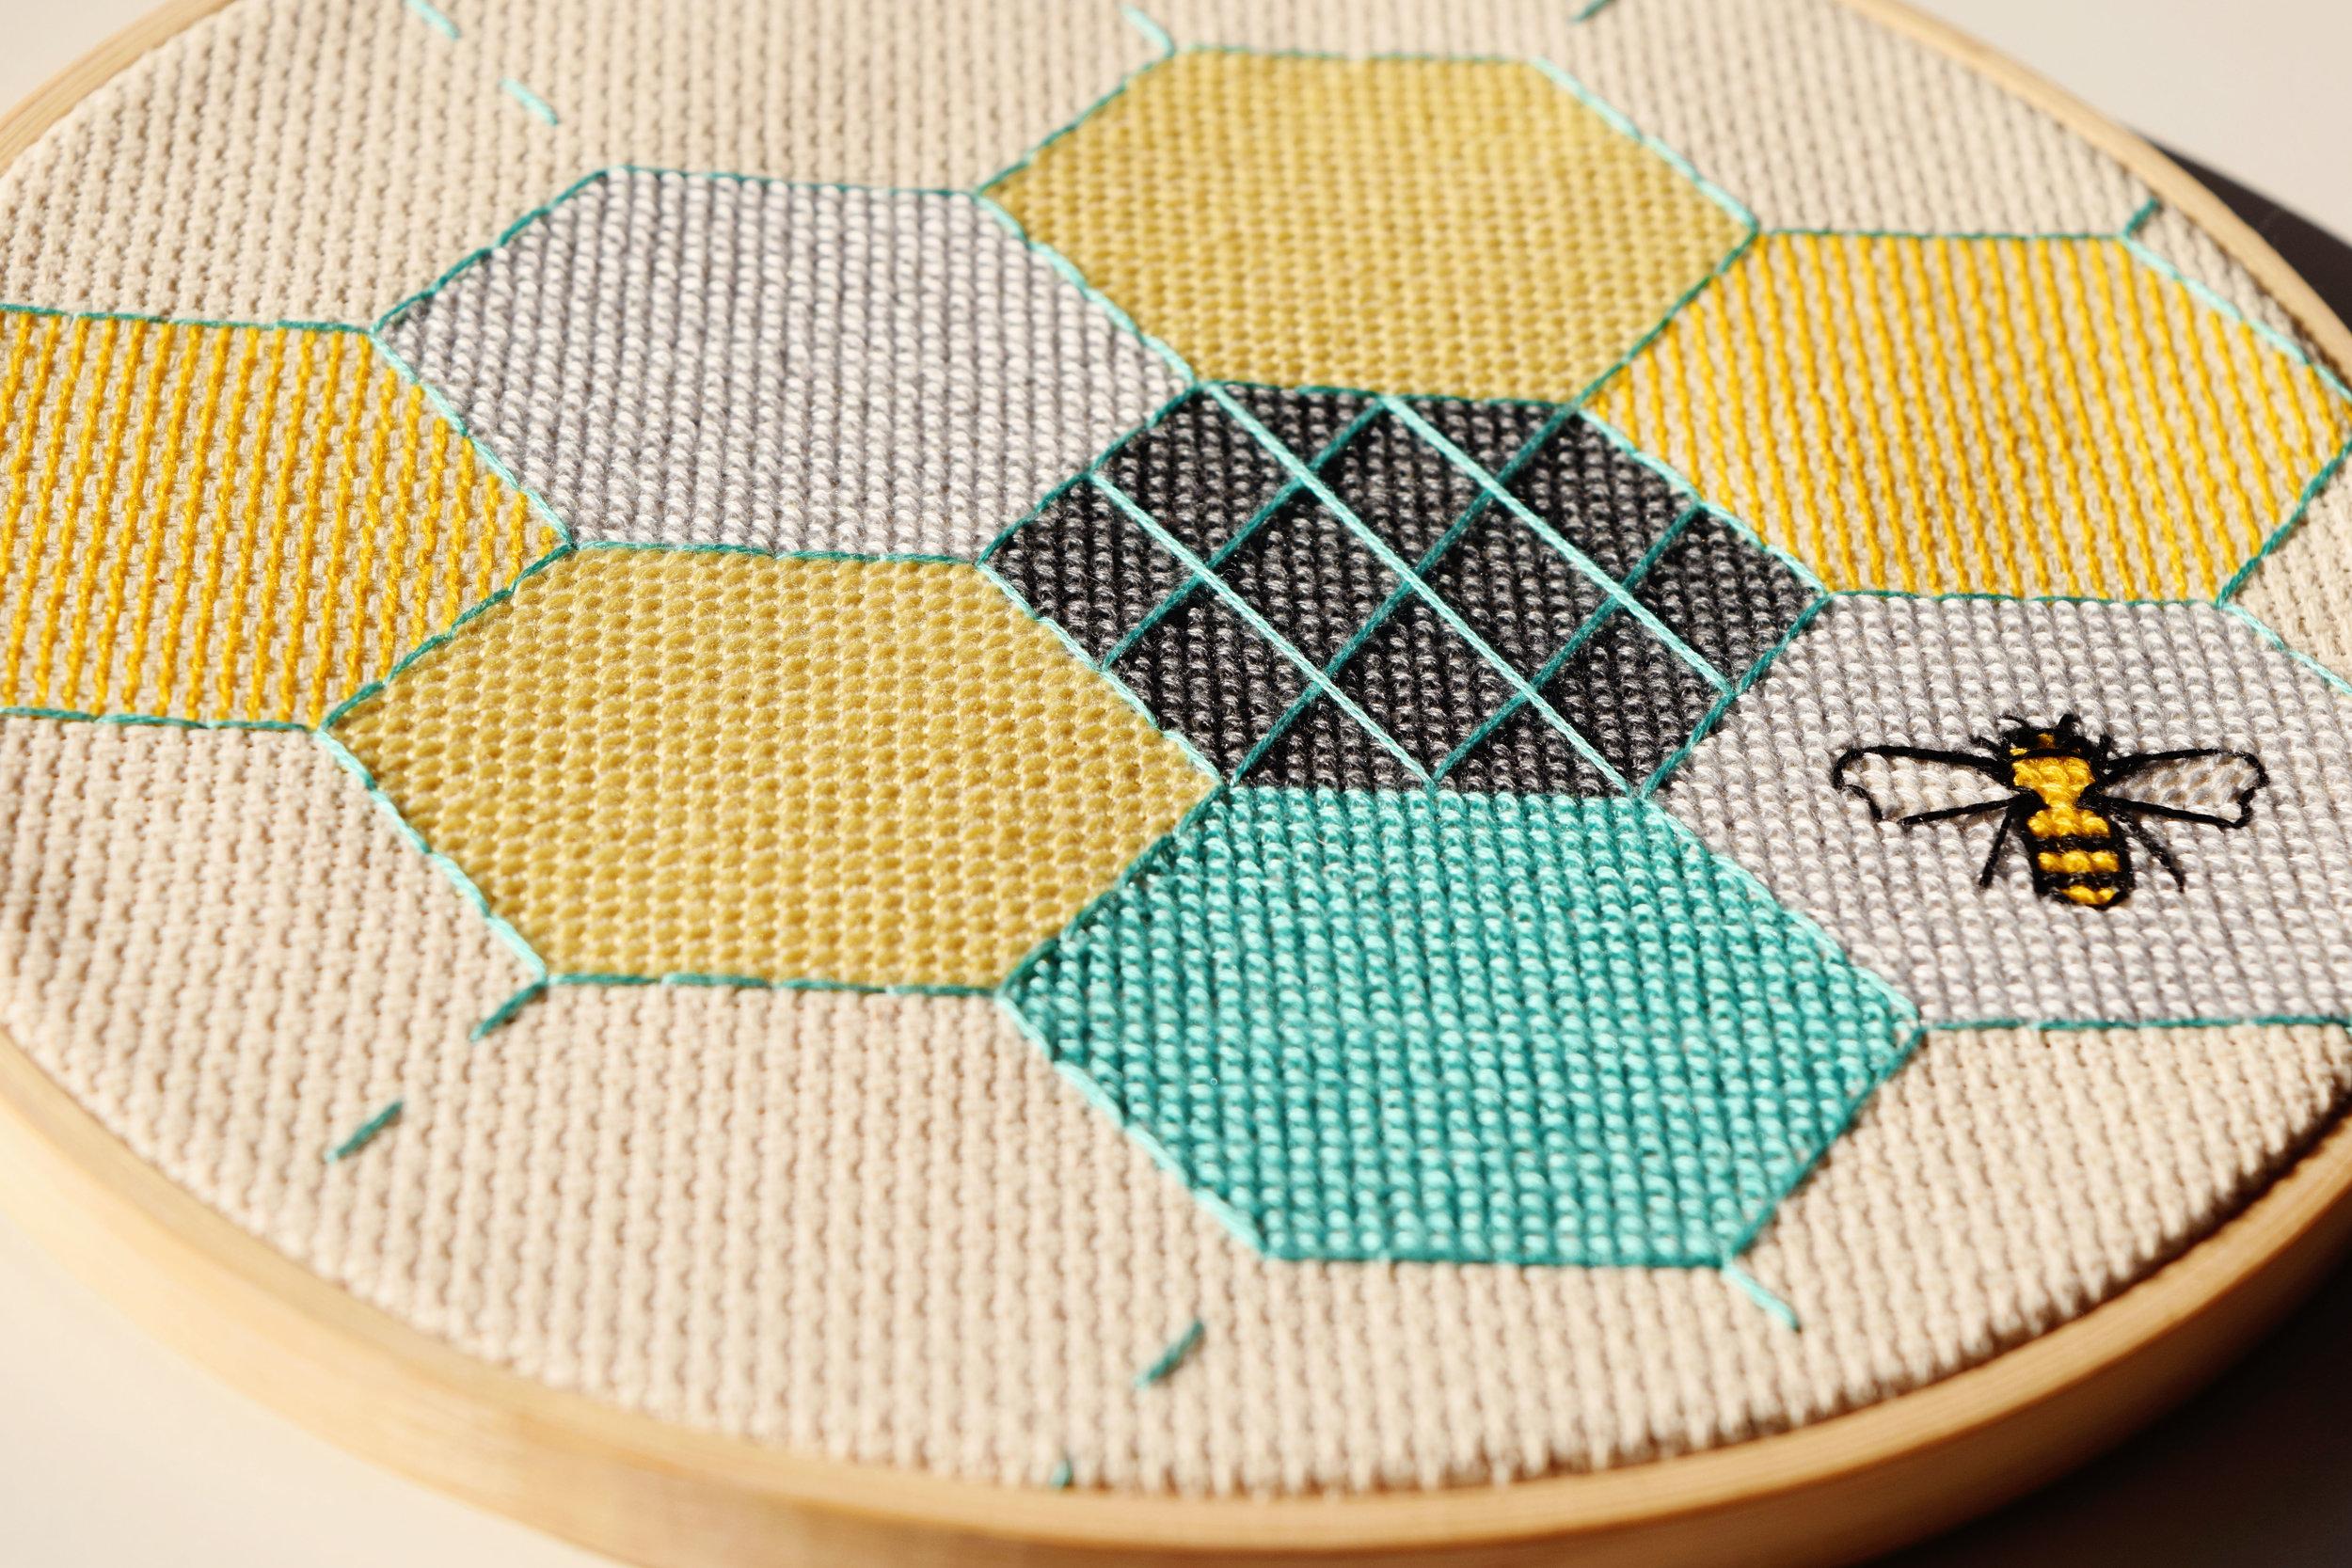 Hive Design | Stitch Octopus